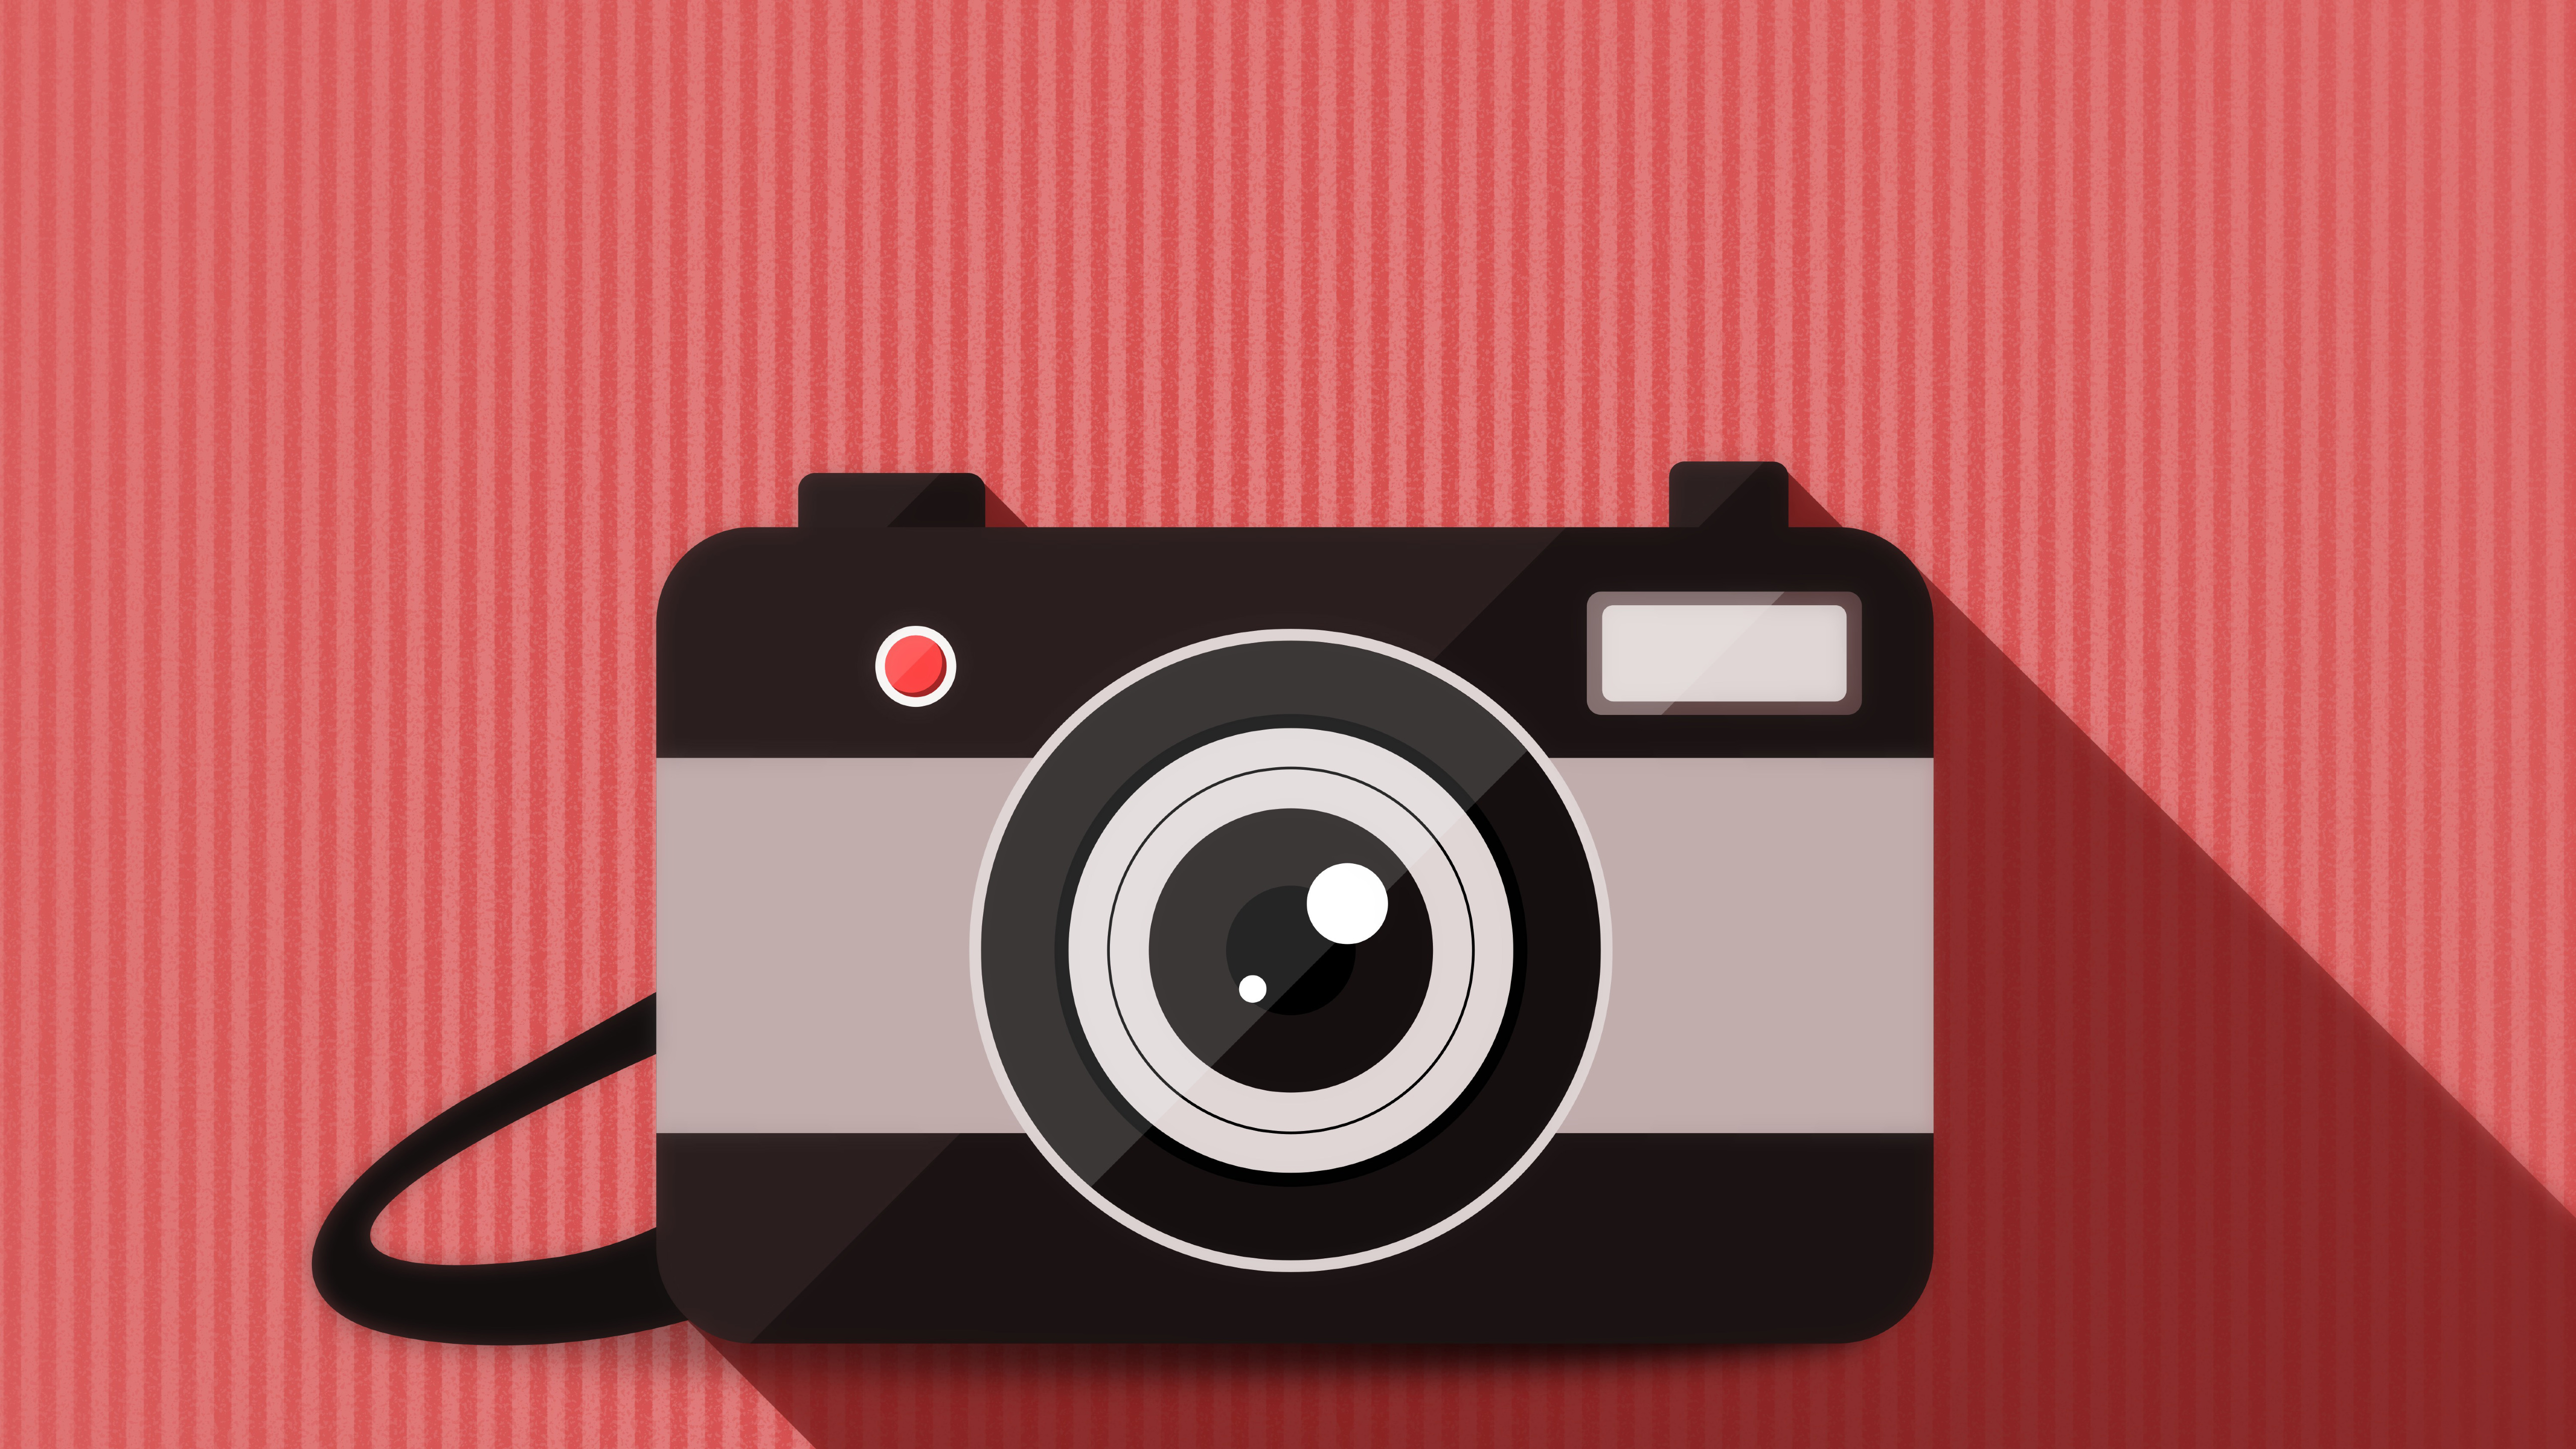 Camera Vector Minimalism Hd 8k Wallpaper